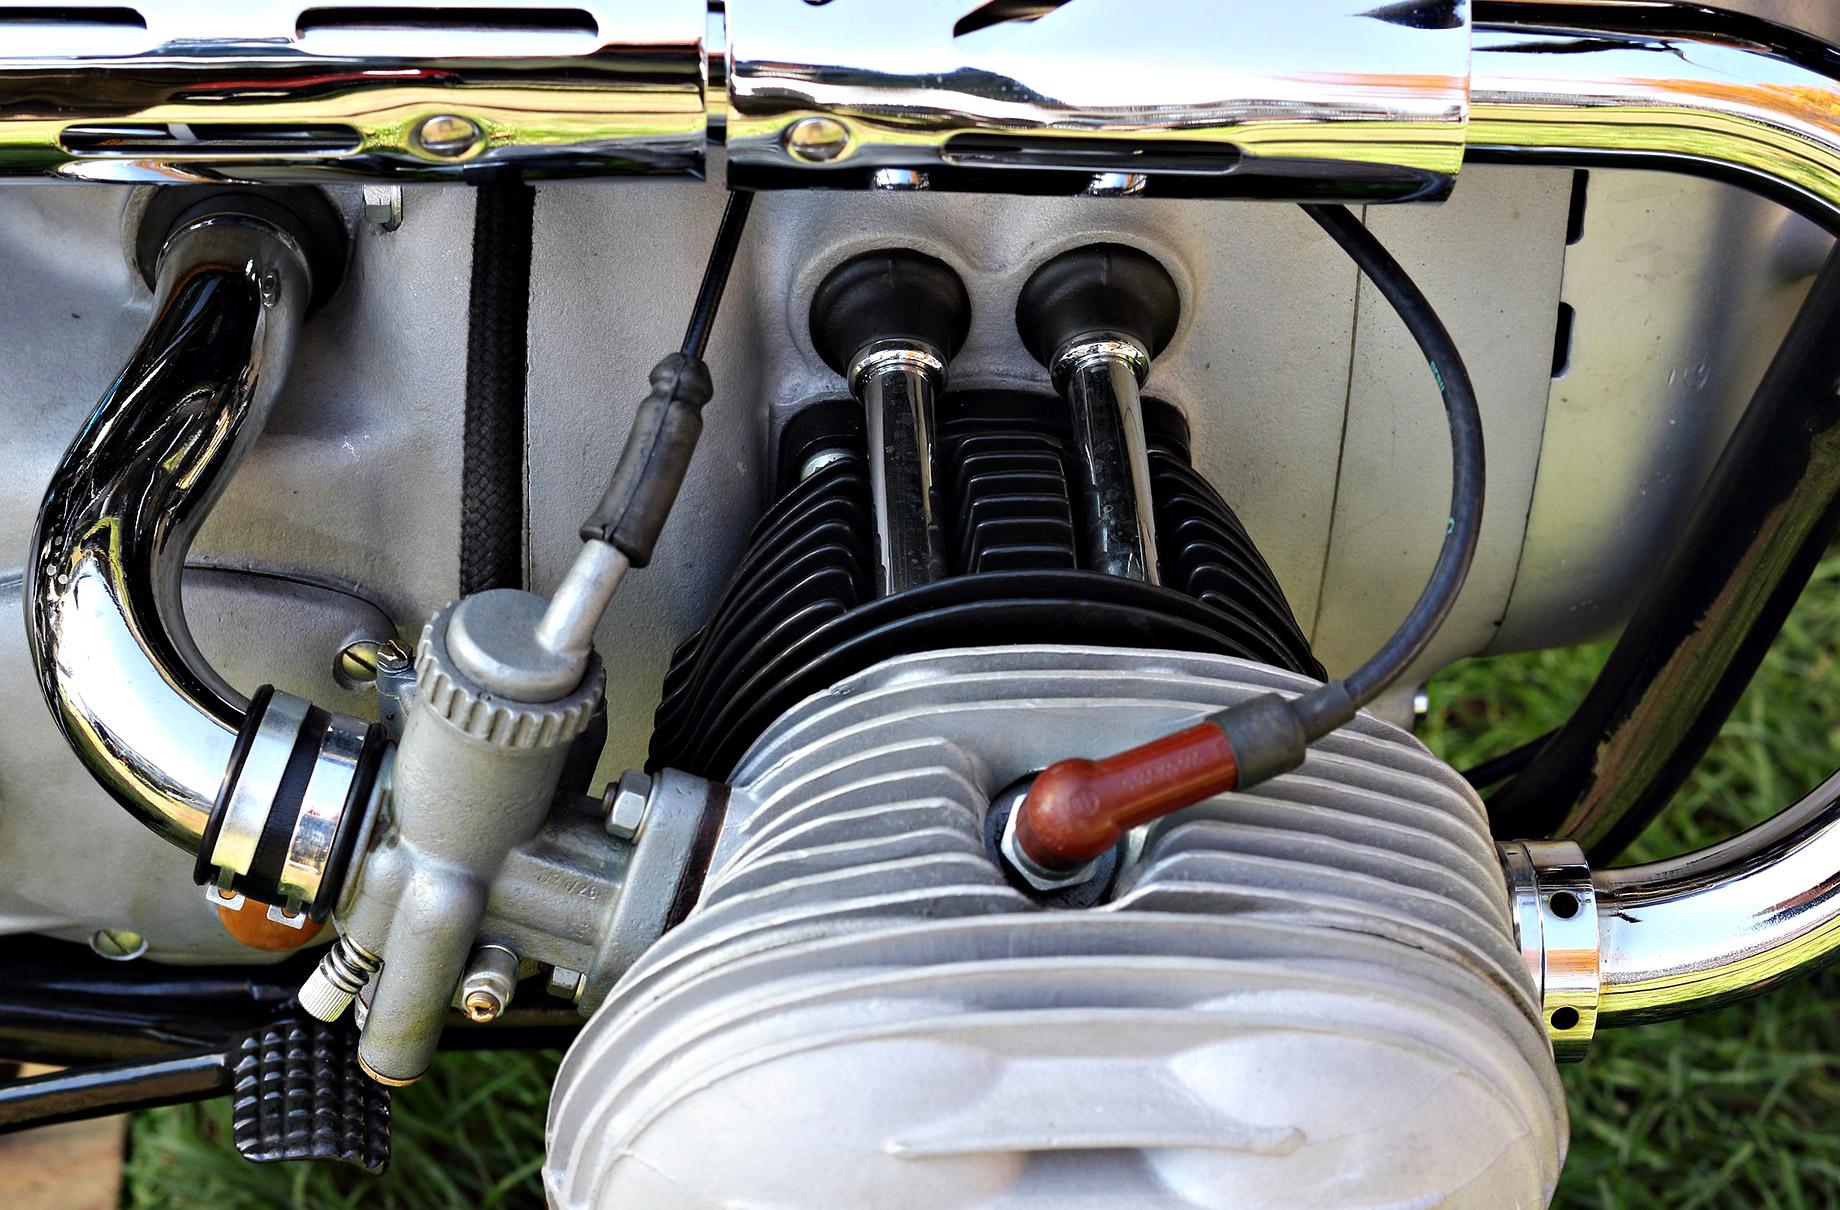 Luxury Showpiece Motorcycle Engine